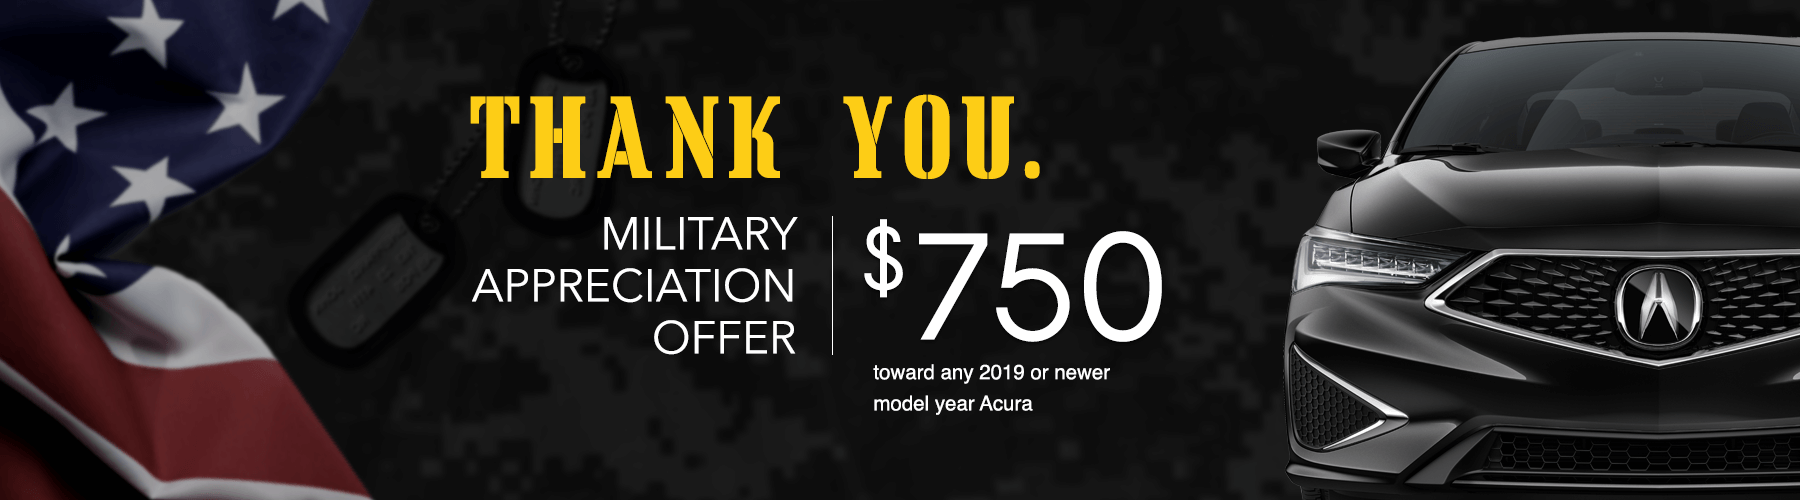 2019 Acura Military Appreciation Offer Slider